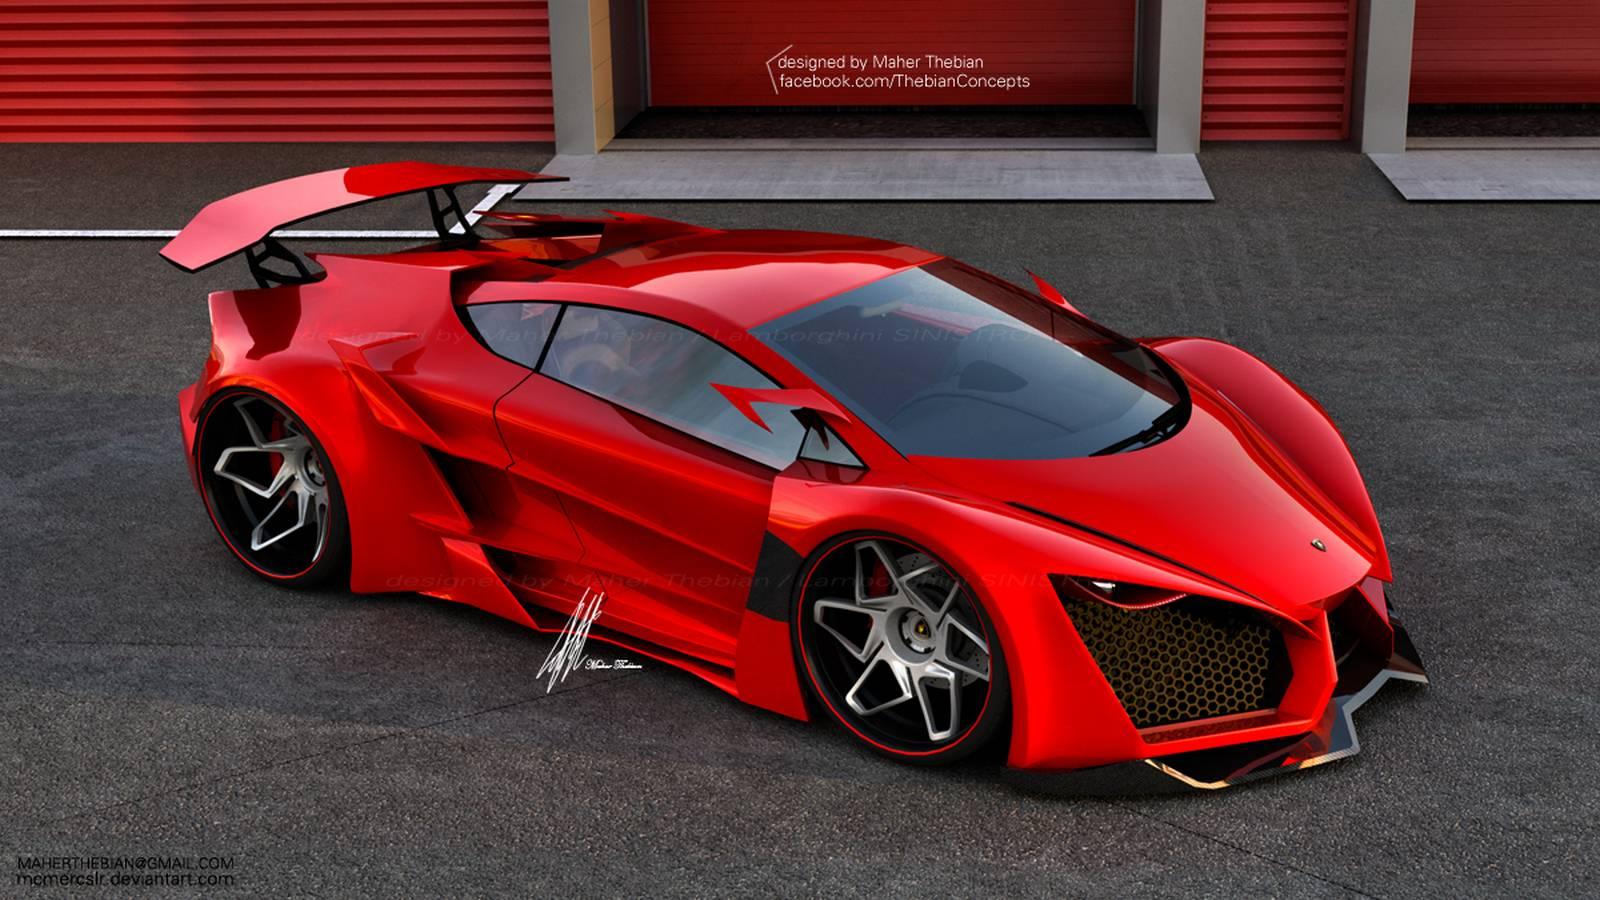 Render: Lamborghini Sinistro By Maher Thebian Design Inspirations